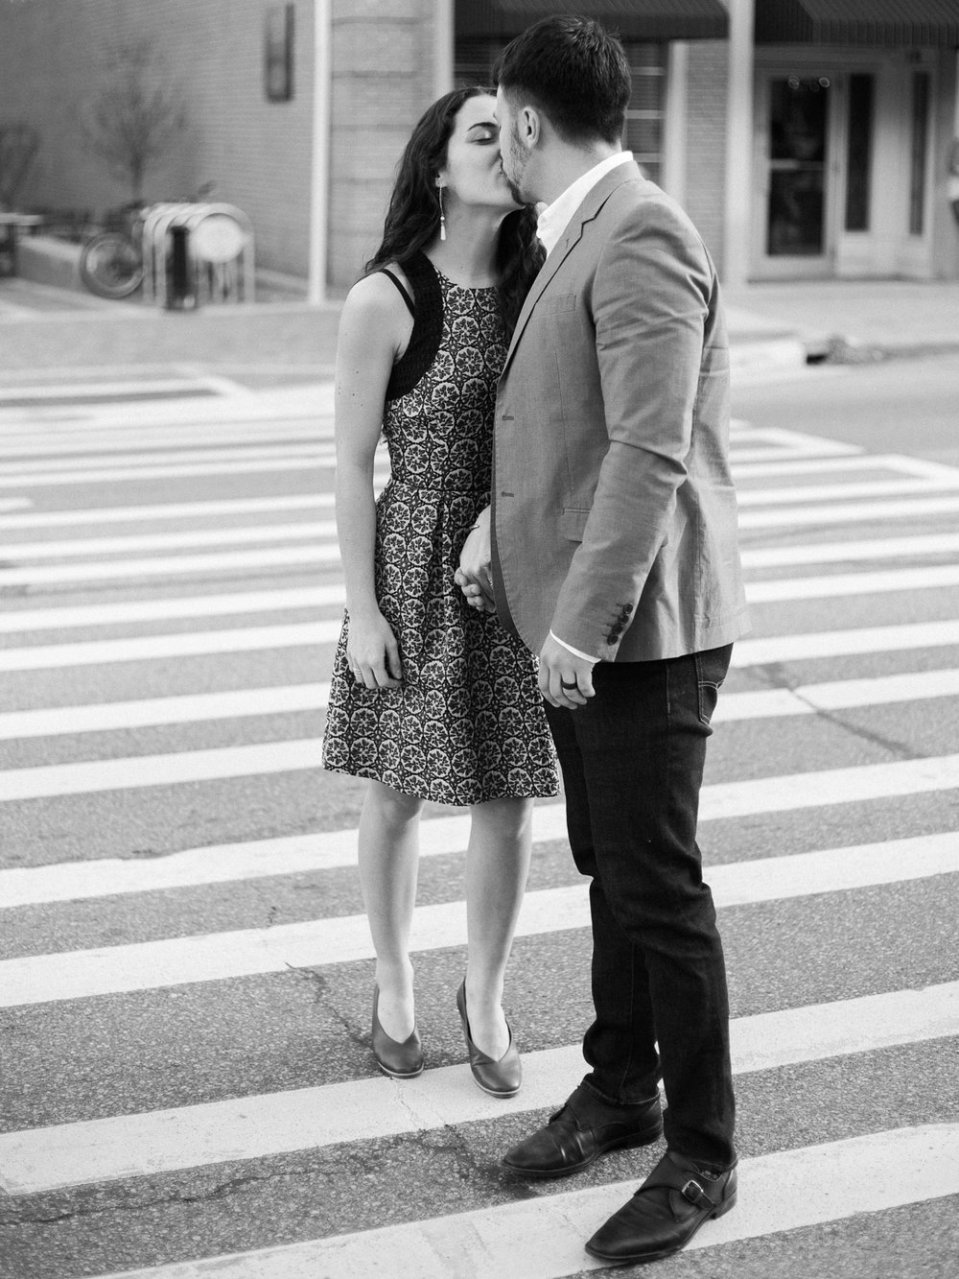 fashion-inspired-couples-photos-12.jpg